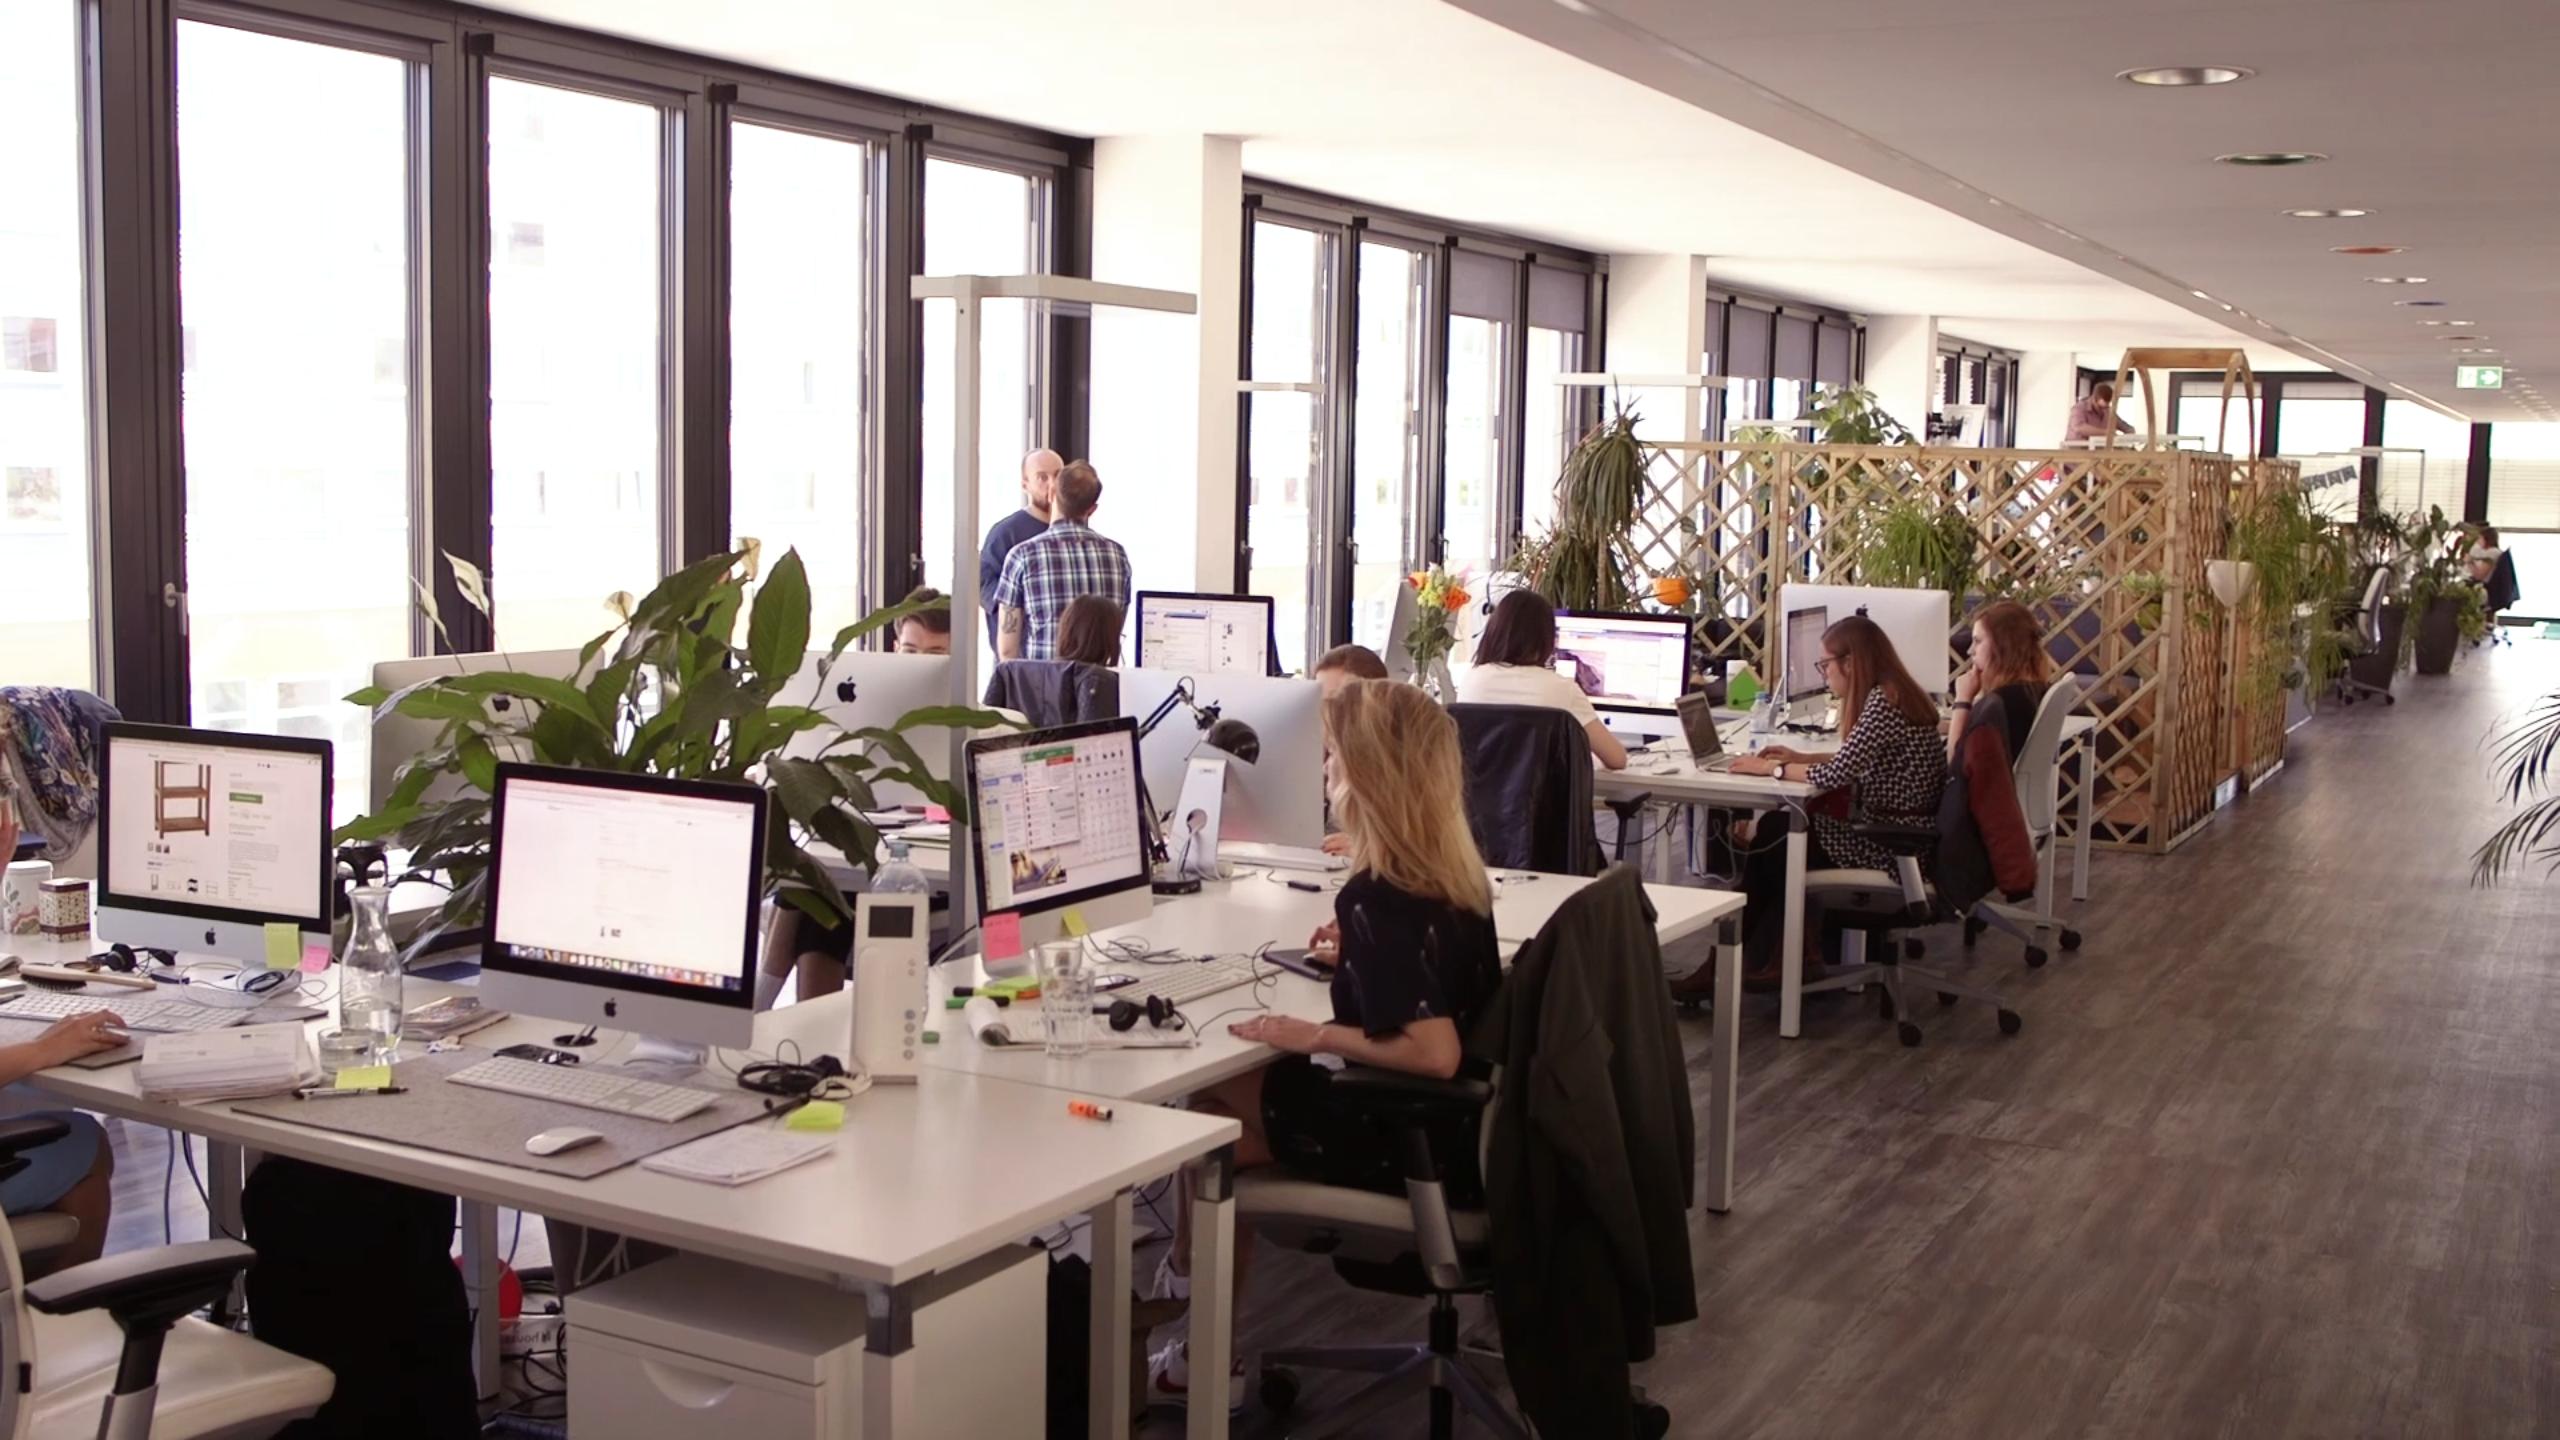 Habitual Media | Airbnb People at desks